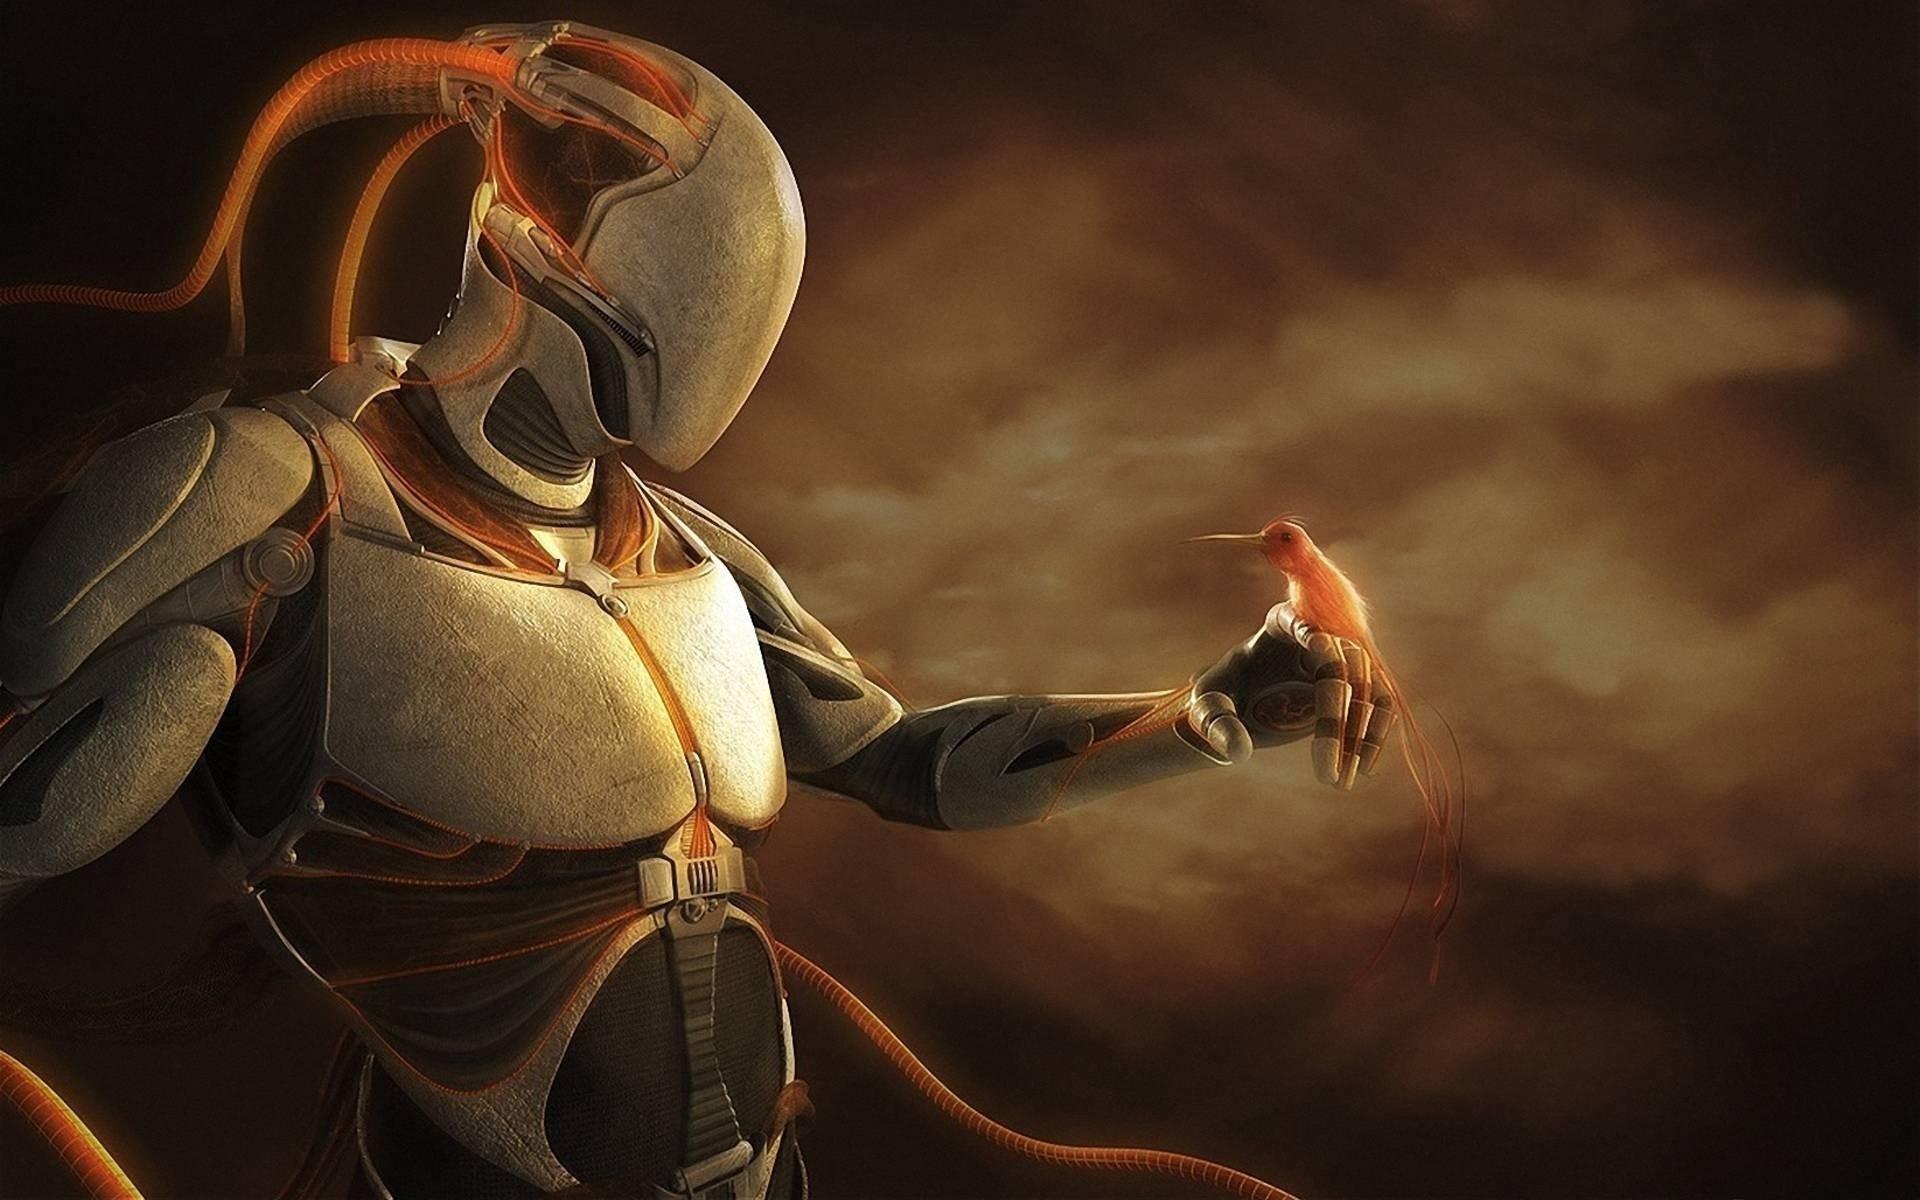 robots have feelings, robot, bird, art, fantasy